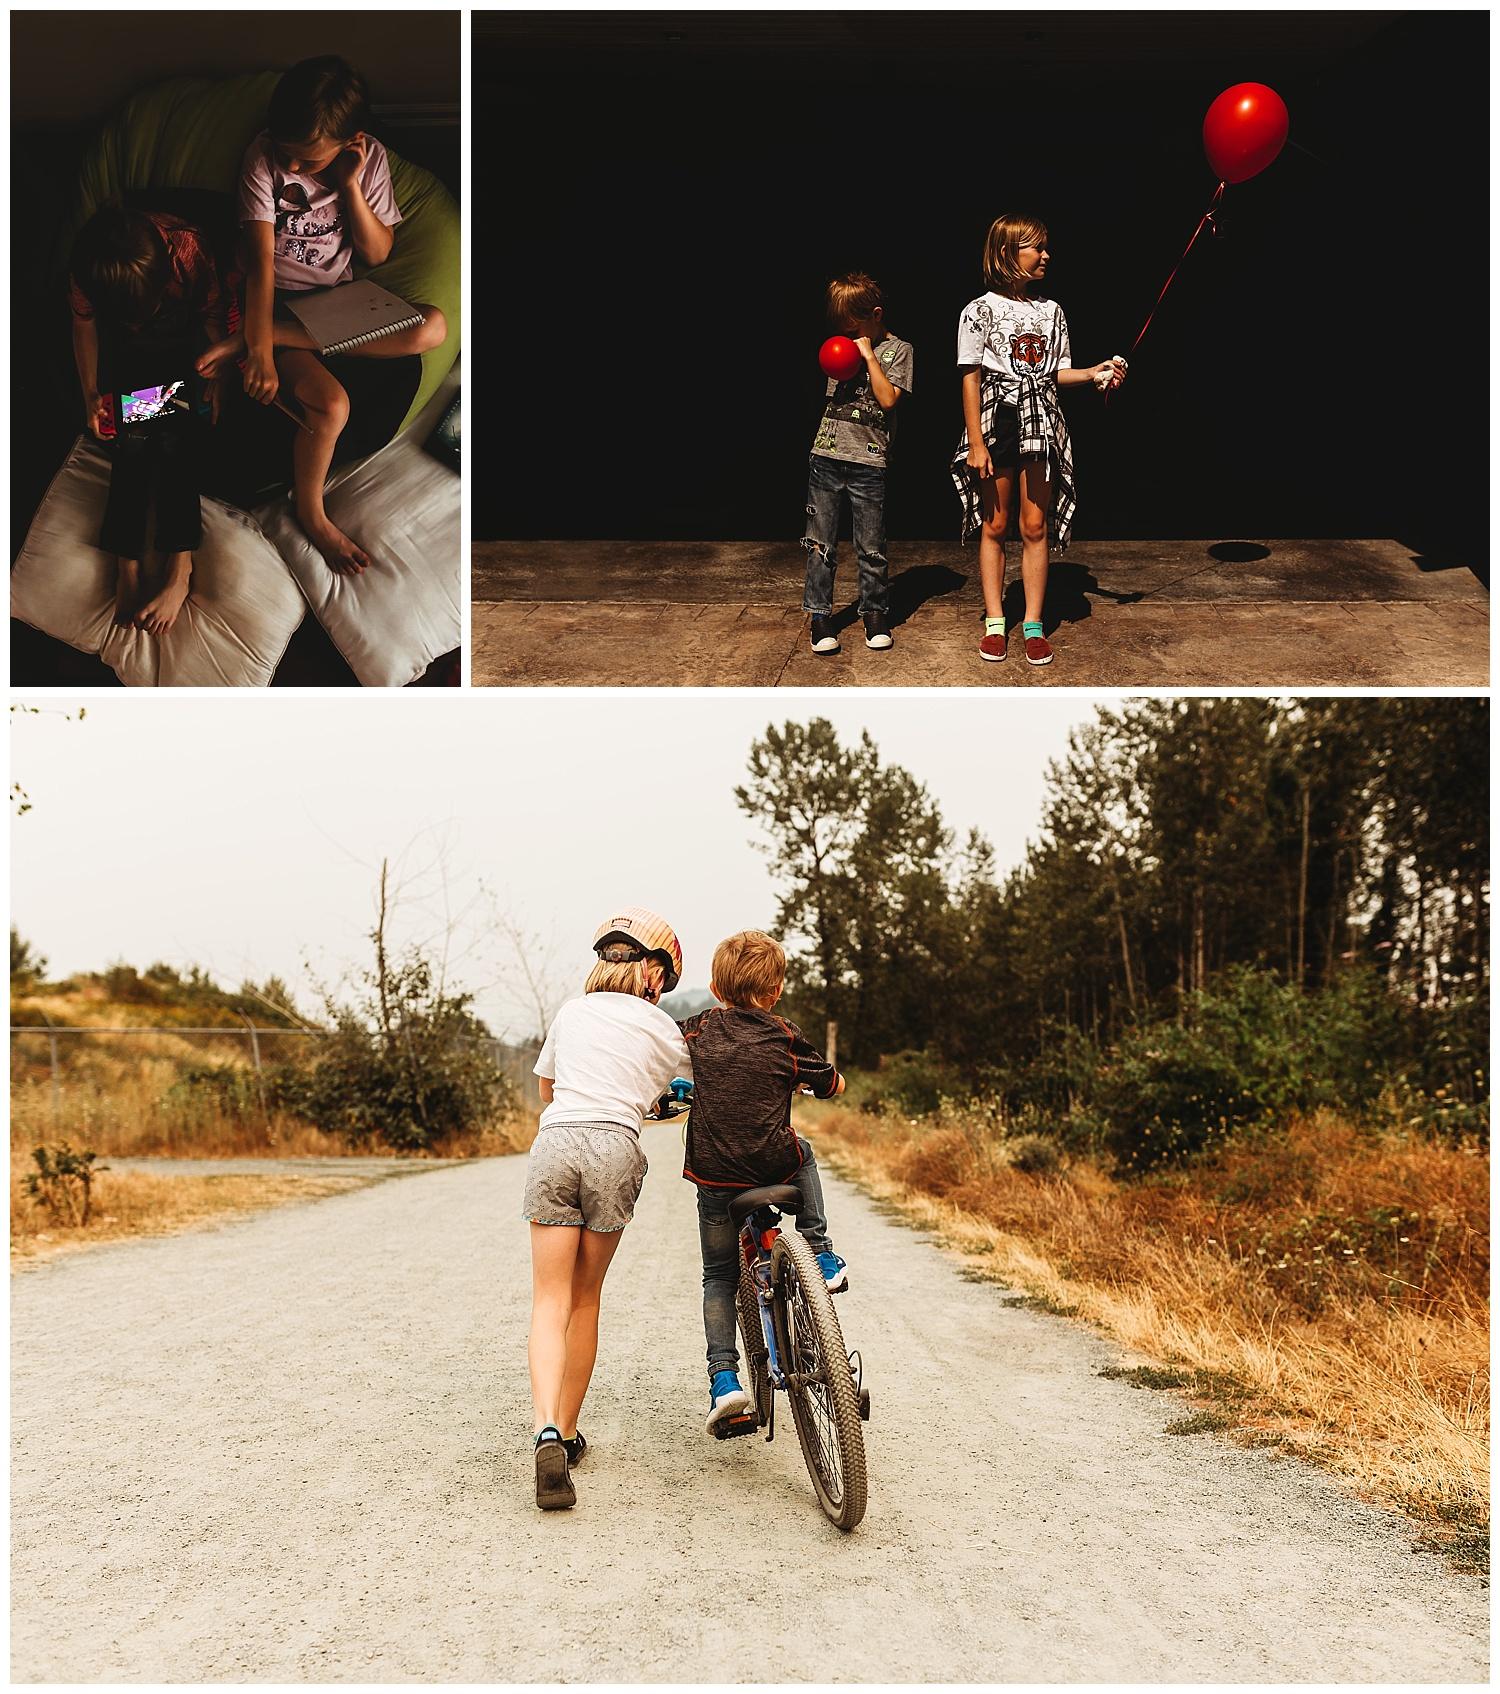 Anna Hurley Photography Summer Days_42.jpg